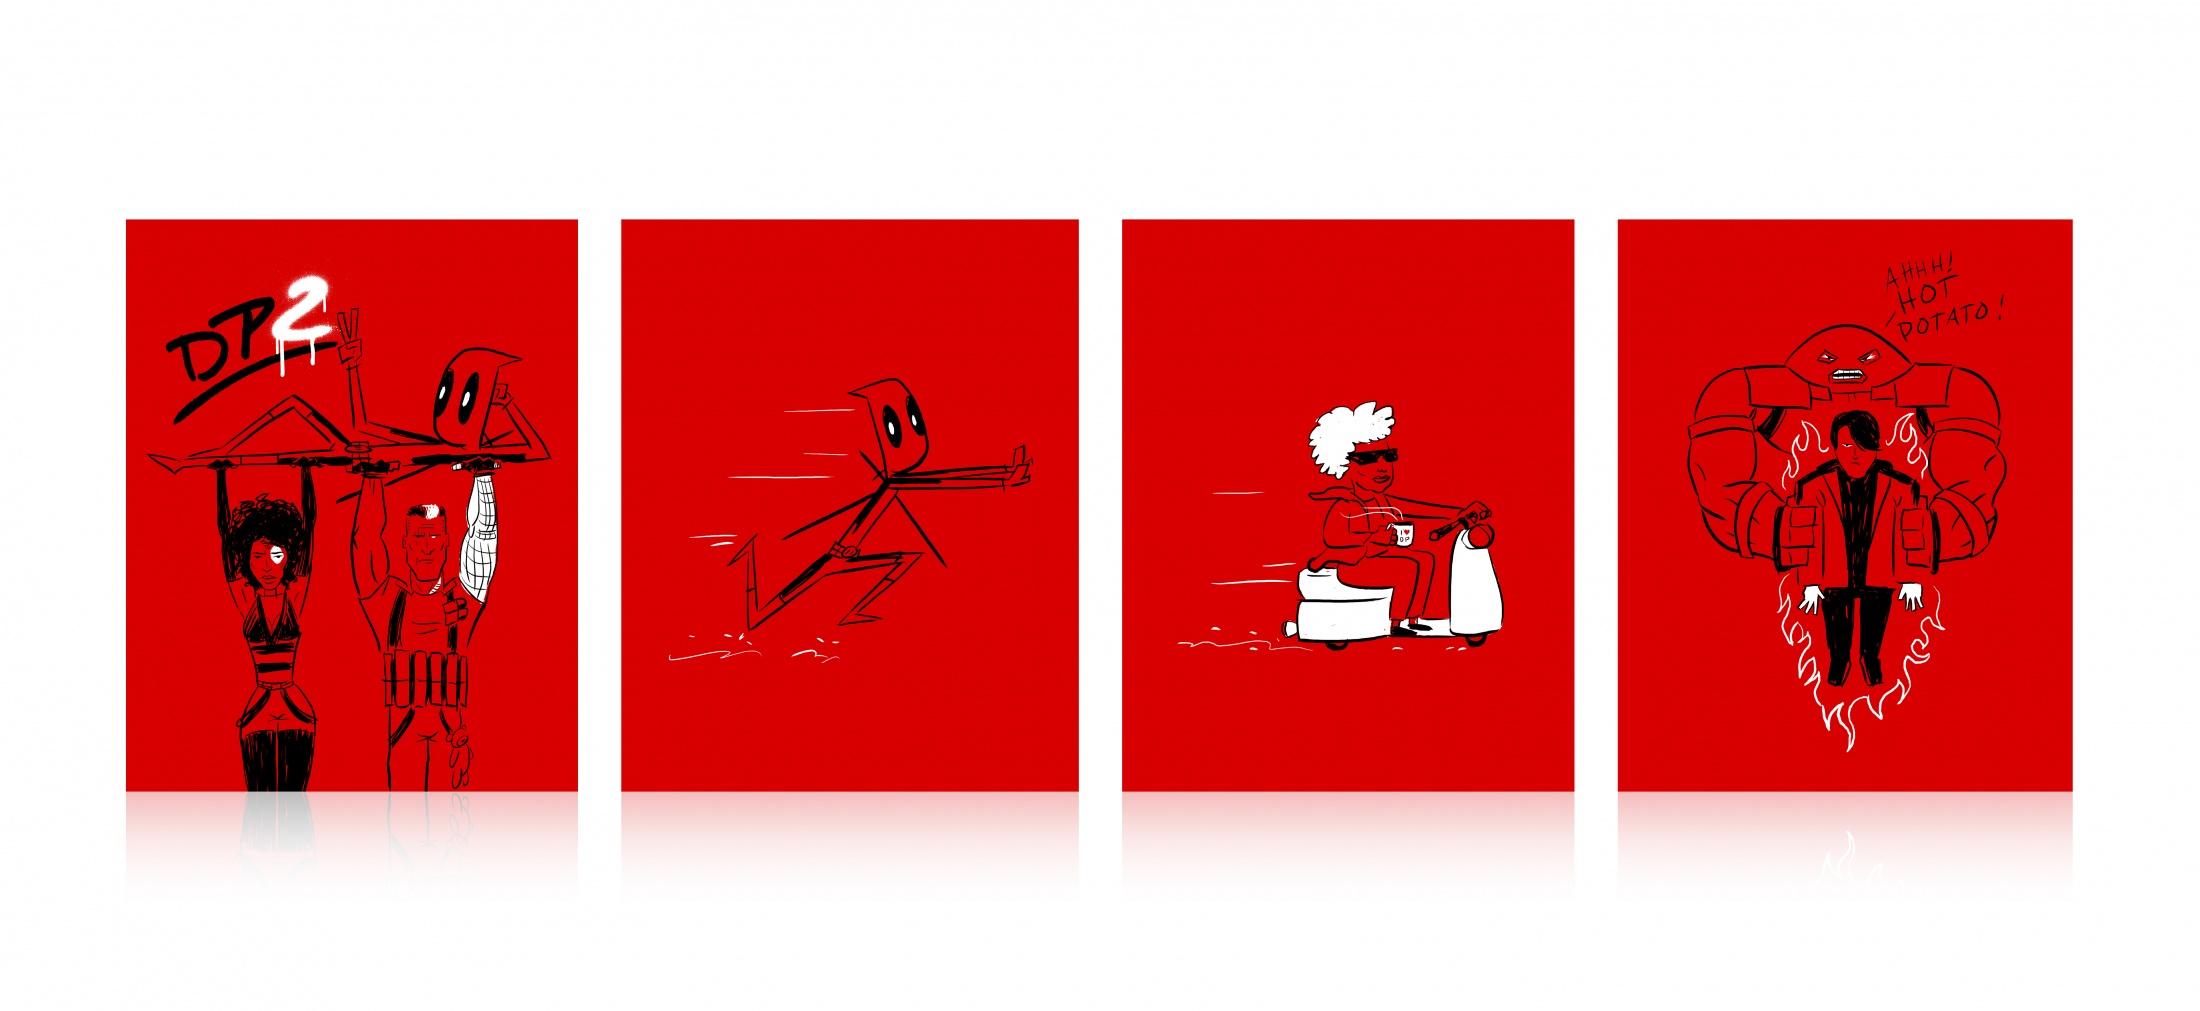 Thumbnail for Deadpool 2 Super Duper $@%!#& Cut Exclusive Steelbook